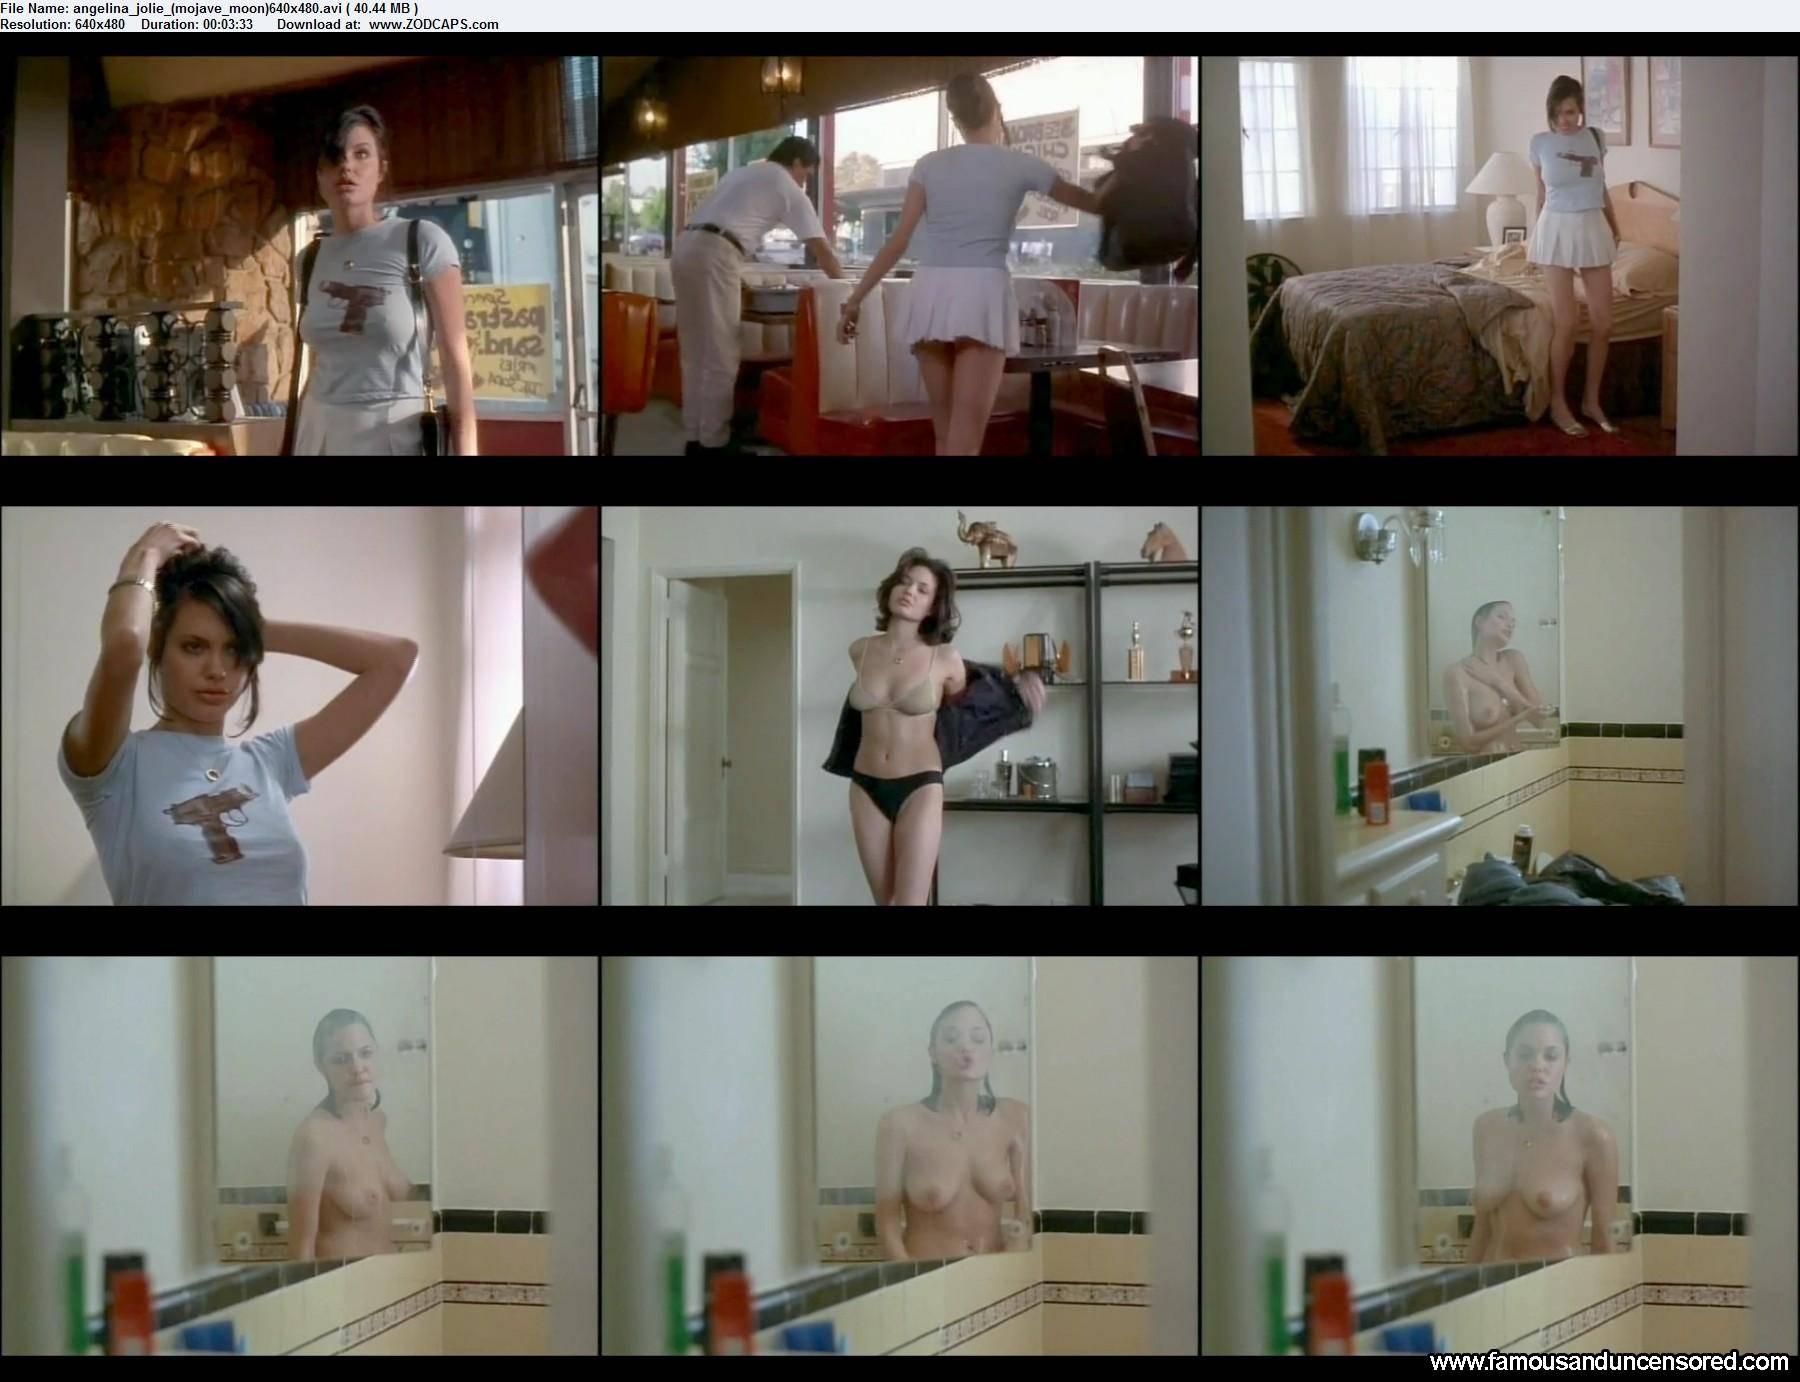 Angelina Jolie Mojave Moon Nude angelina jolie mojave moon mojave moon beautiful celebrity